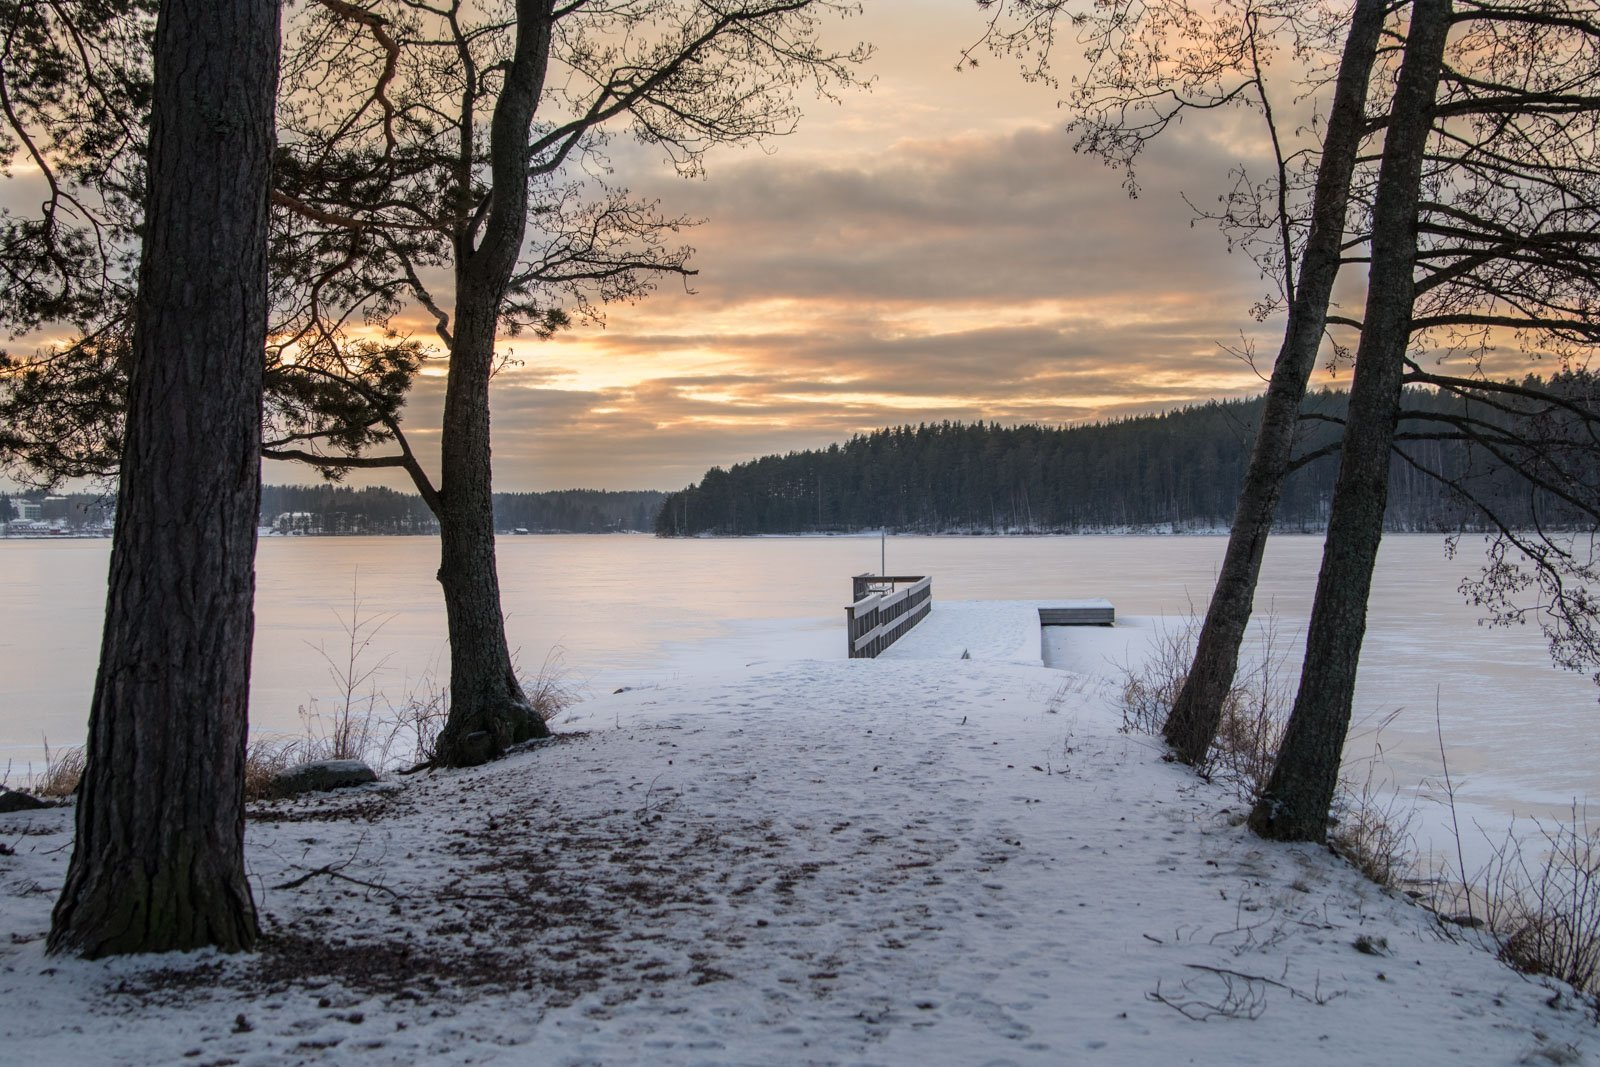 Laituri / Dock